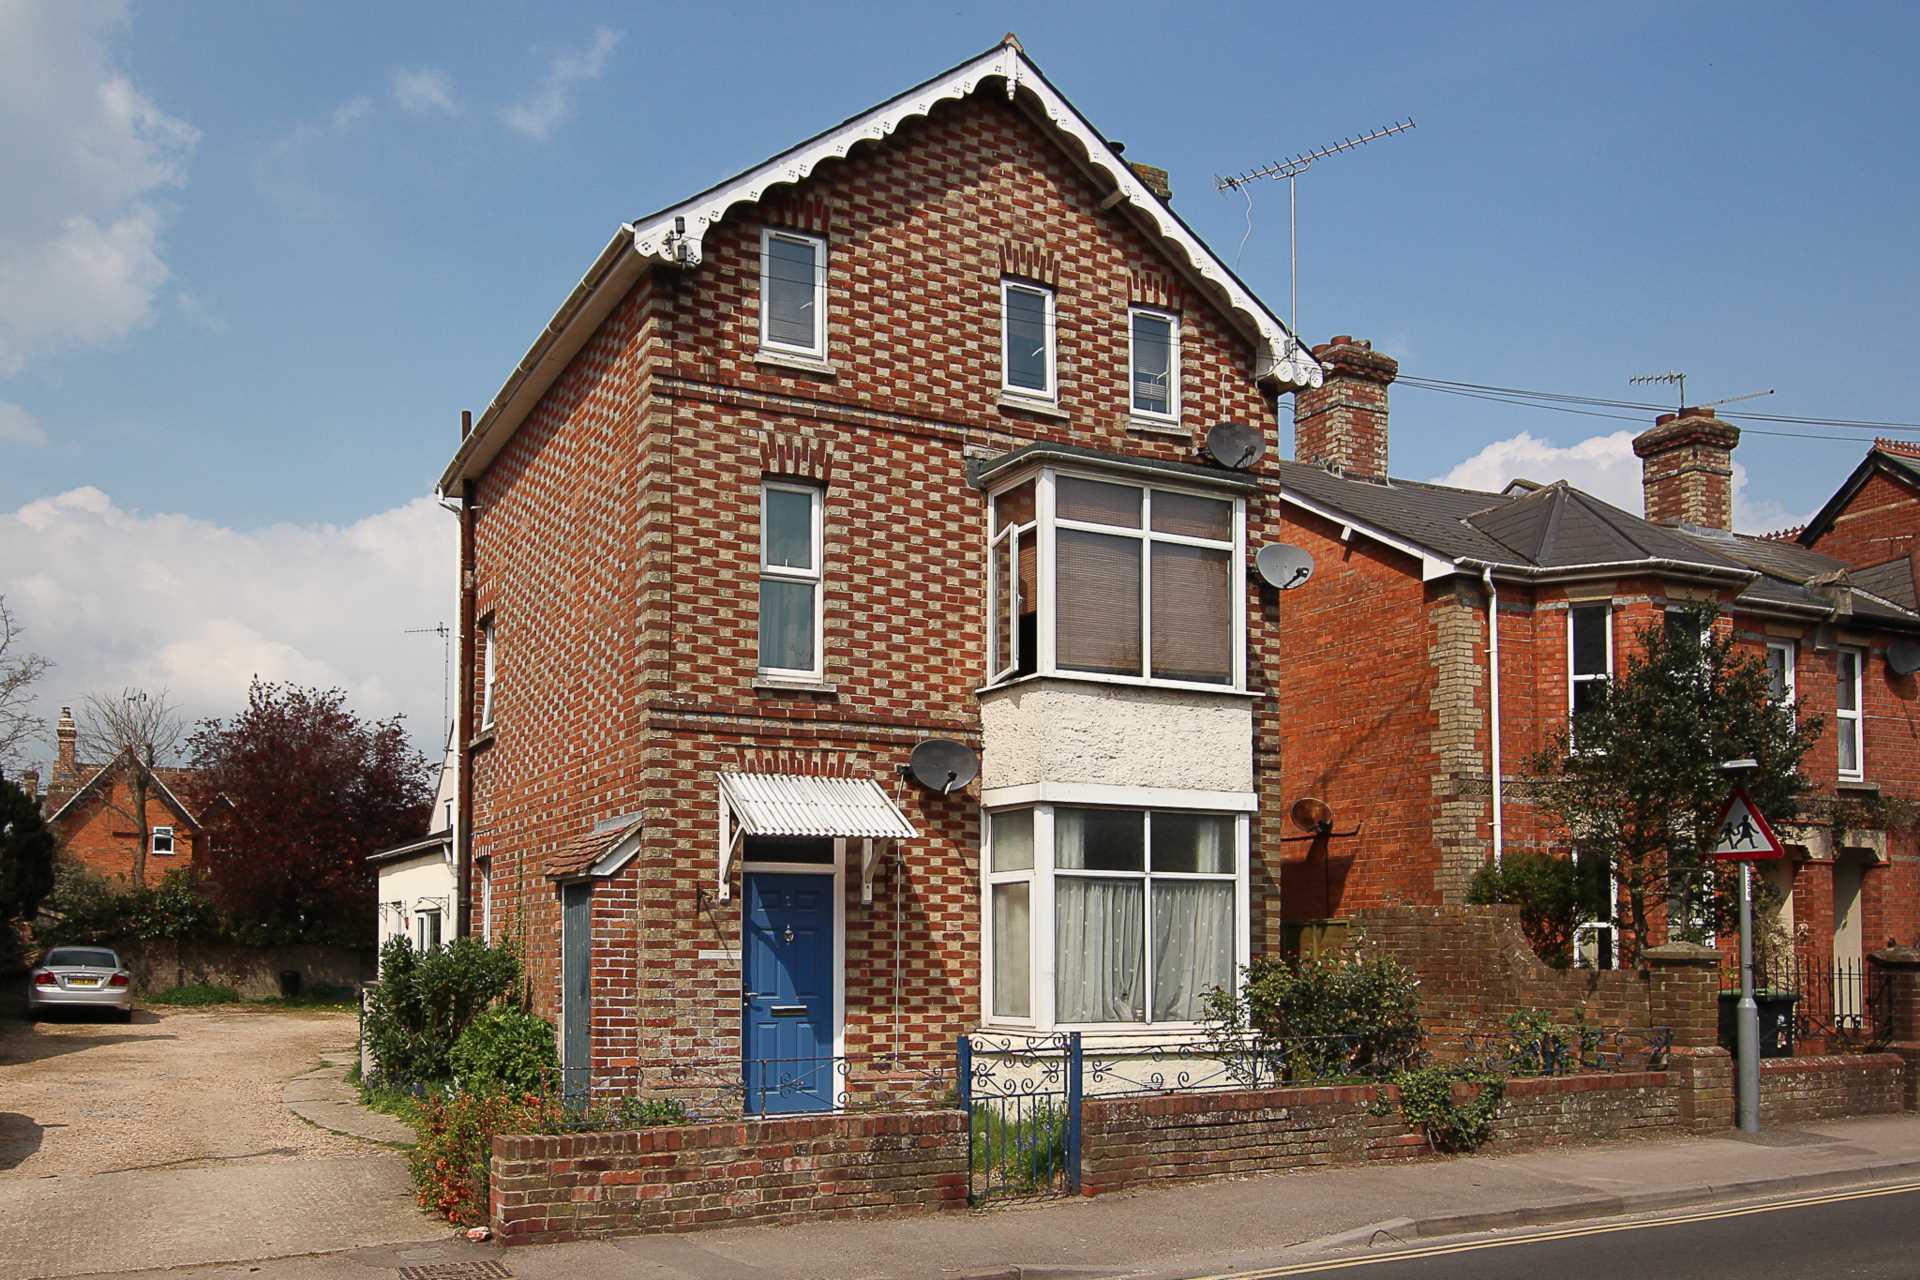 1 bed flat for sale in Salisbury Road, Blandford Forum, Blandford Forum  - Property Image 1